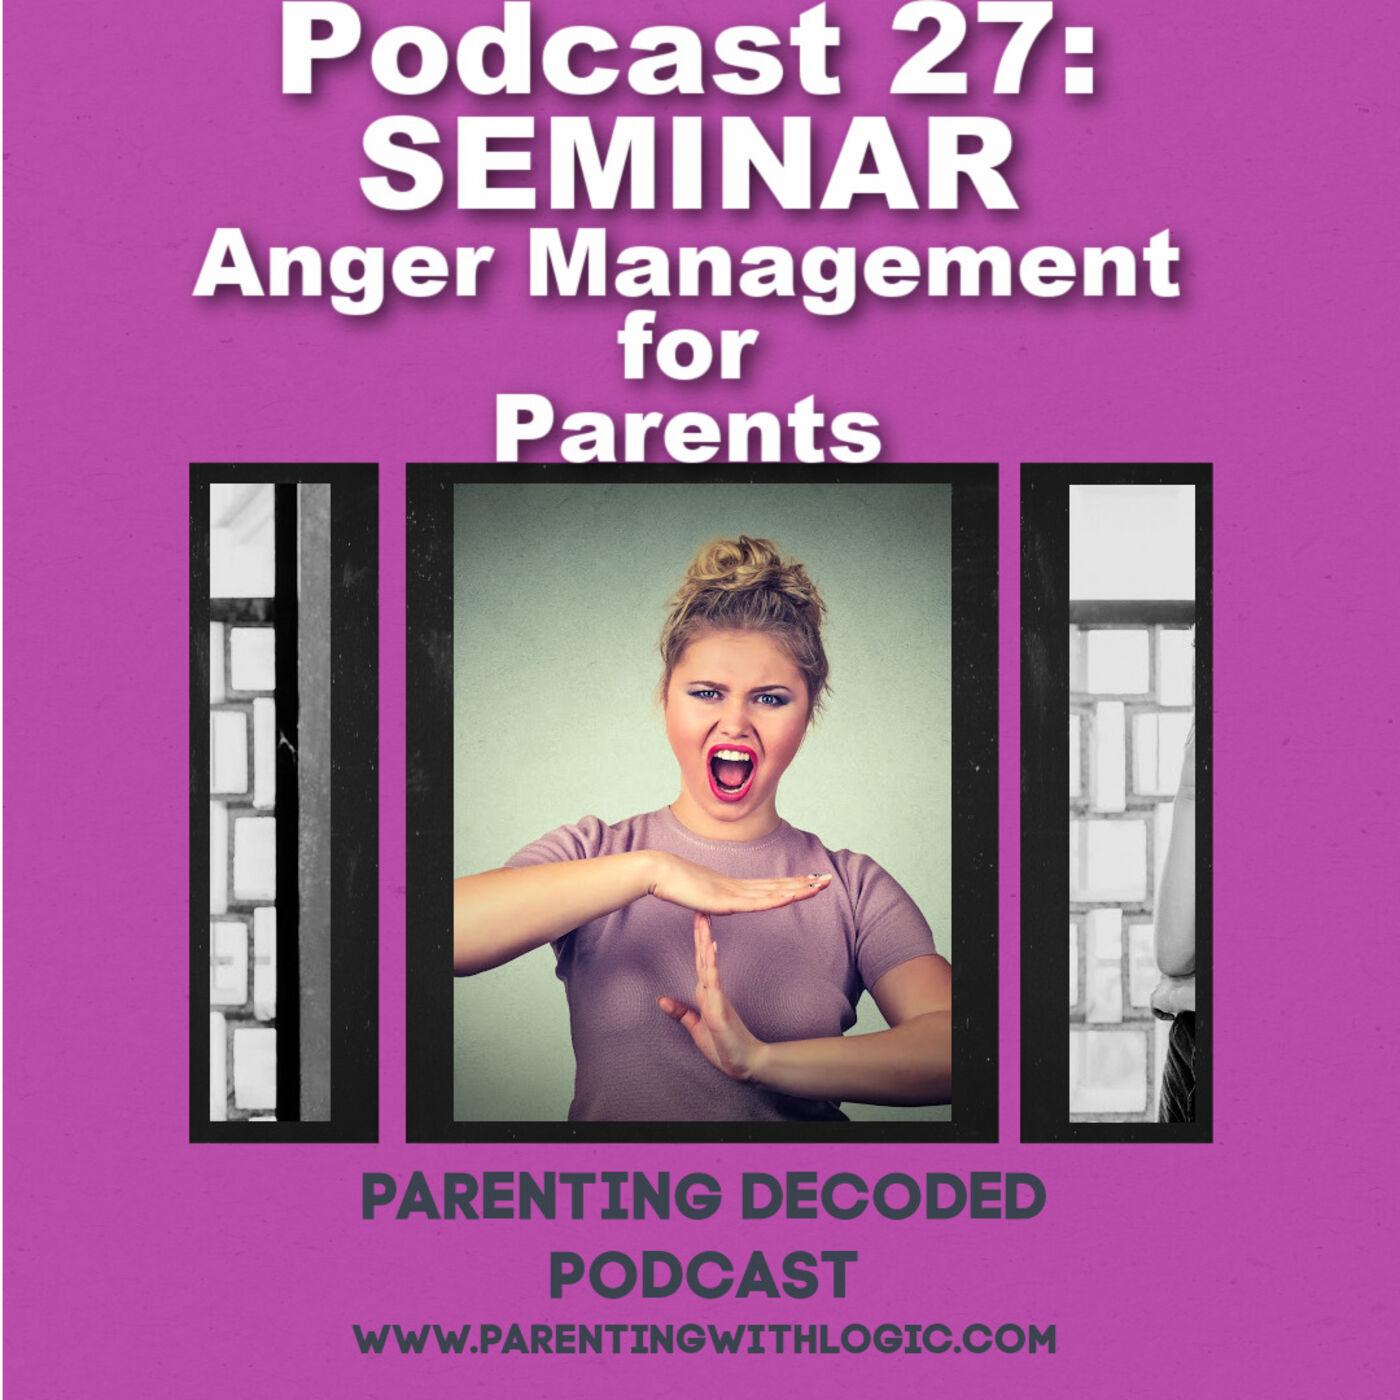 27 - Anger Management for Parents SEMINAR